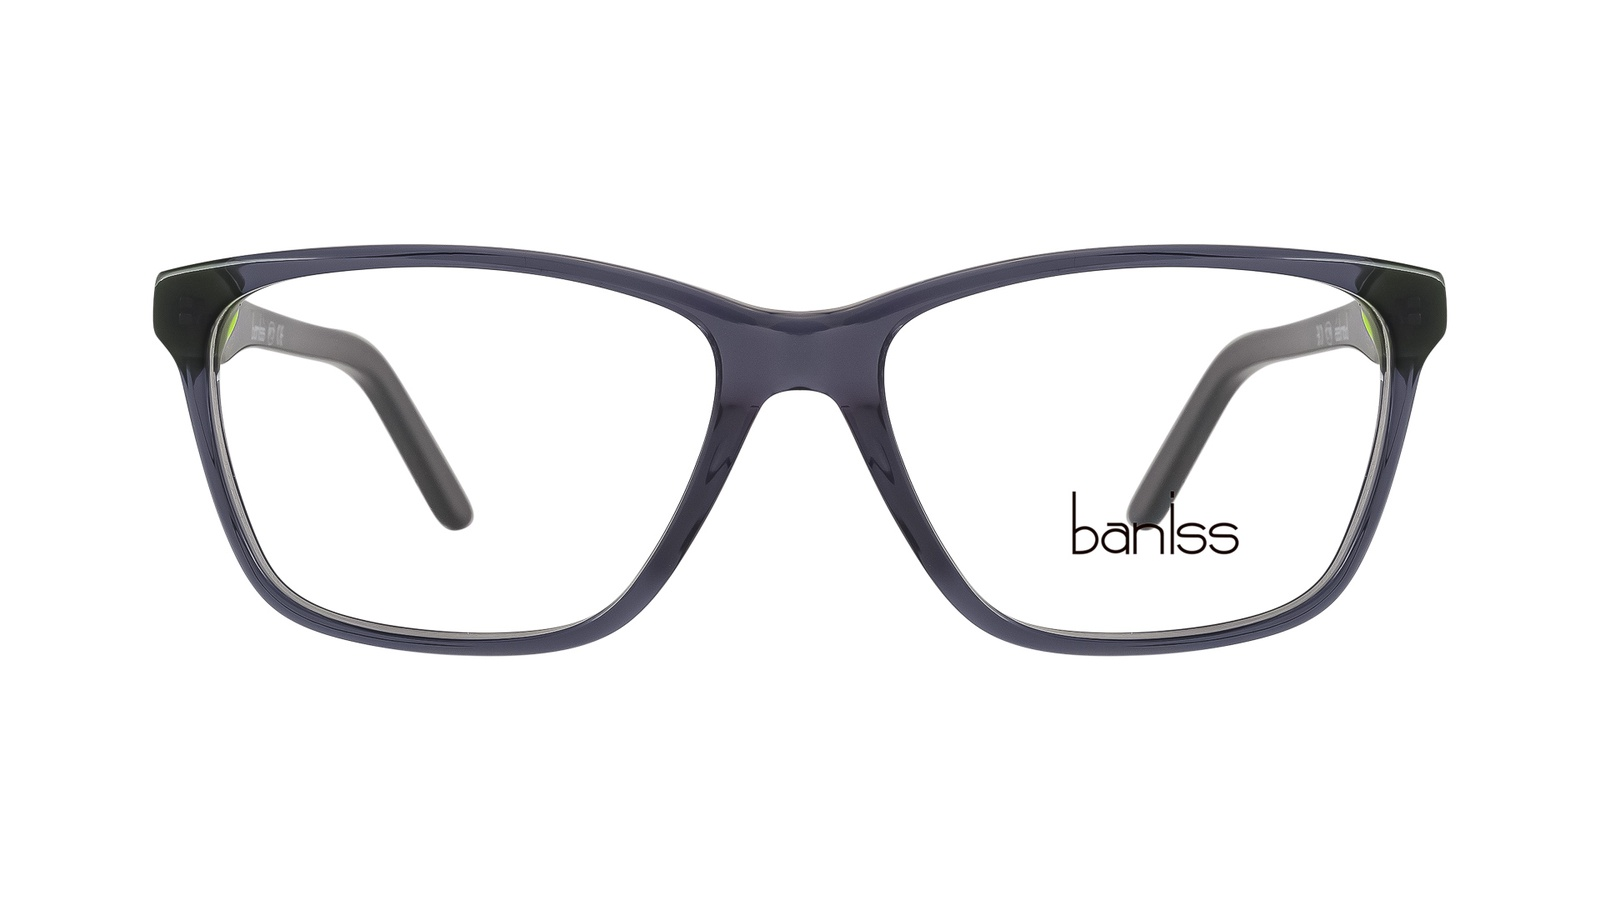 Оправа для очков, BANISS, пластик, BS8033 C02